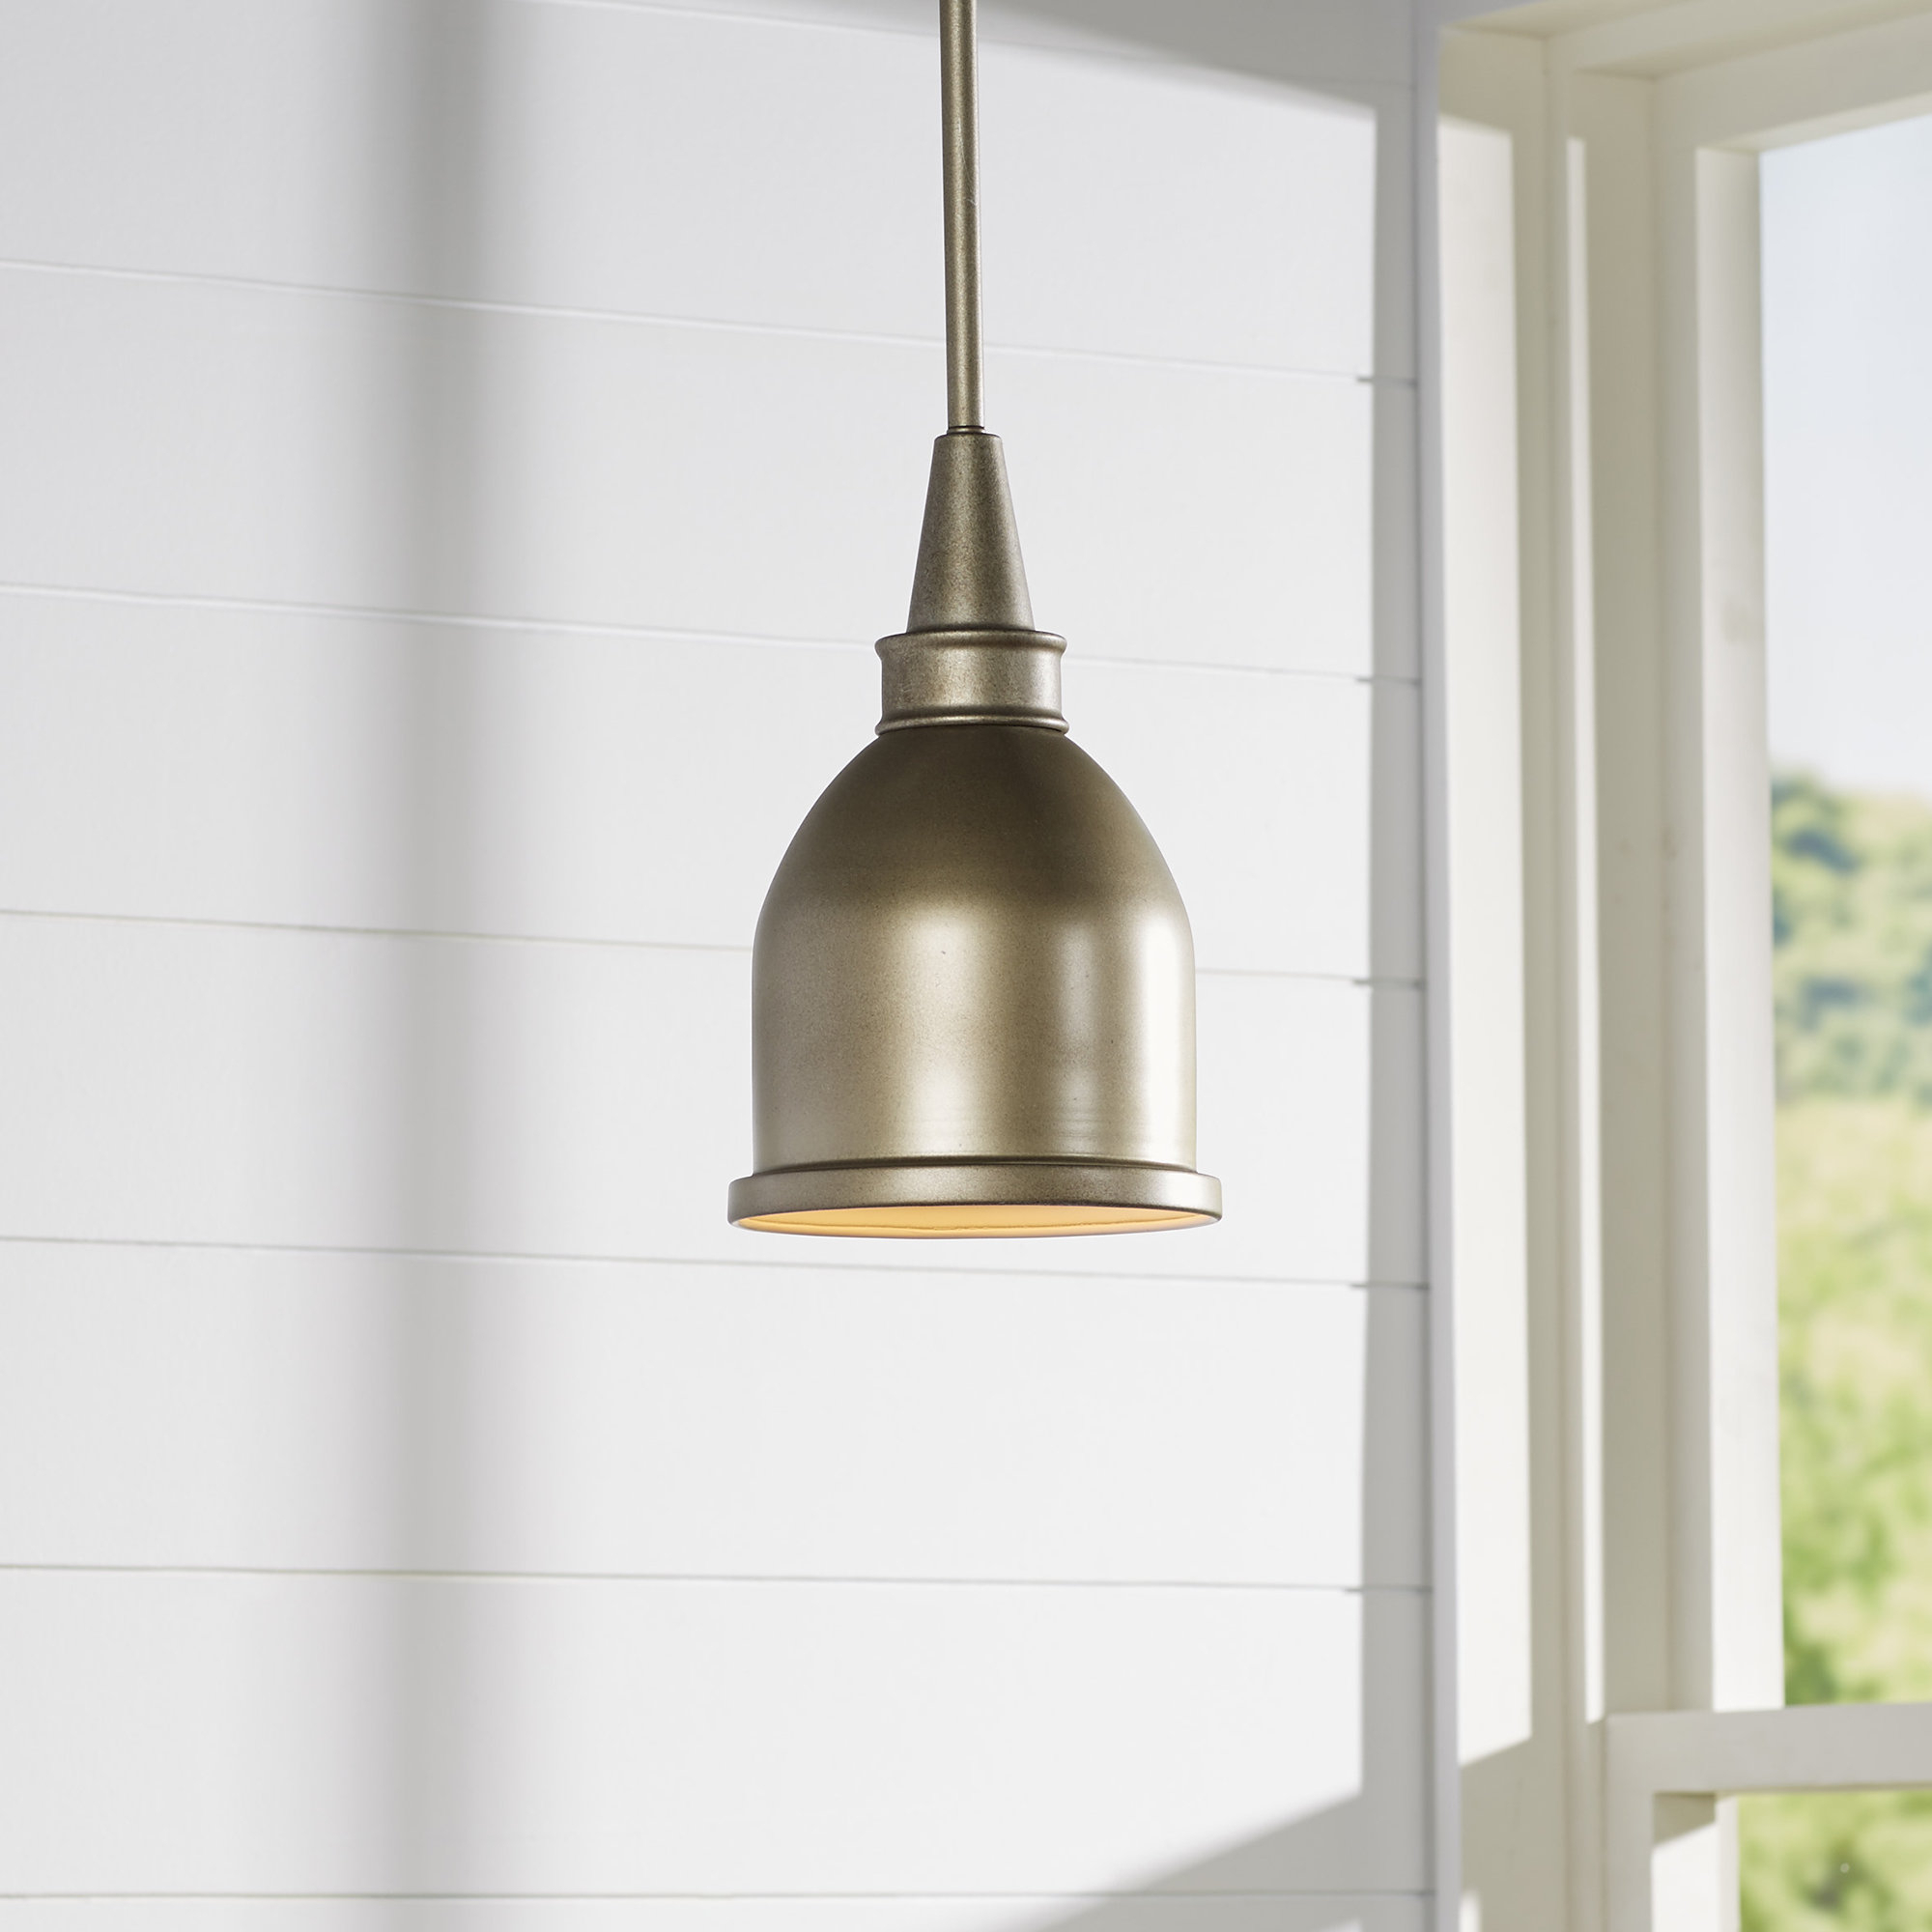 Manston 1 Light Single Bell Pendant With Regard To Recent Bundaberg 1 Light Single Bell Pendants (View 13 of 20)